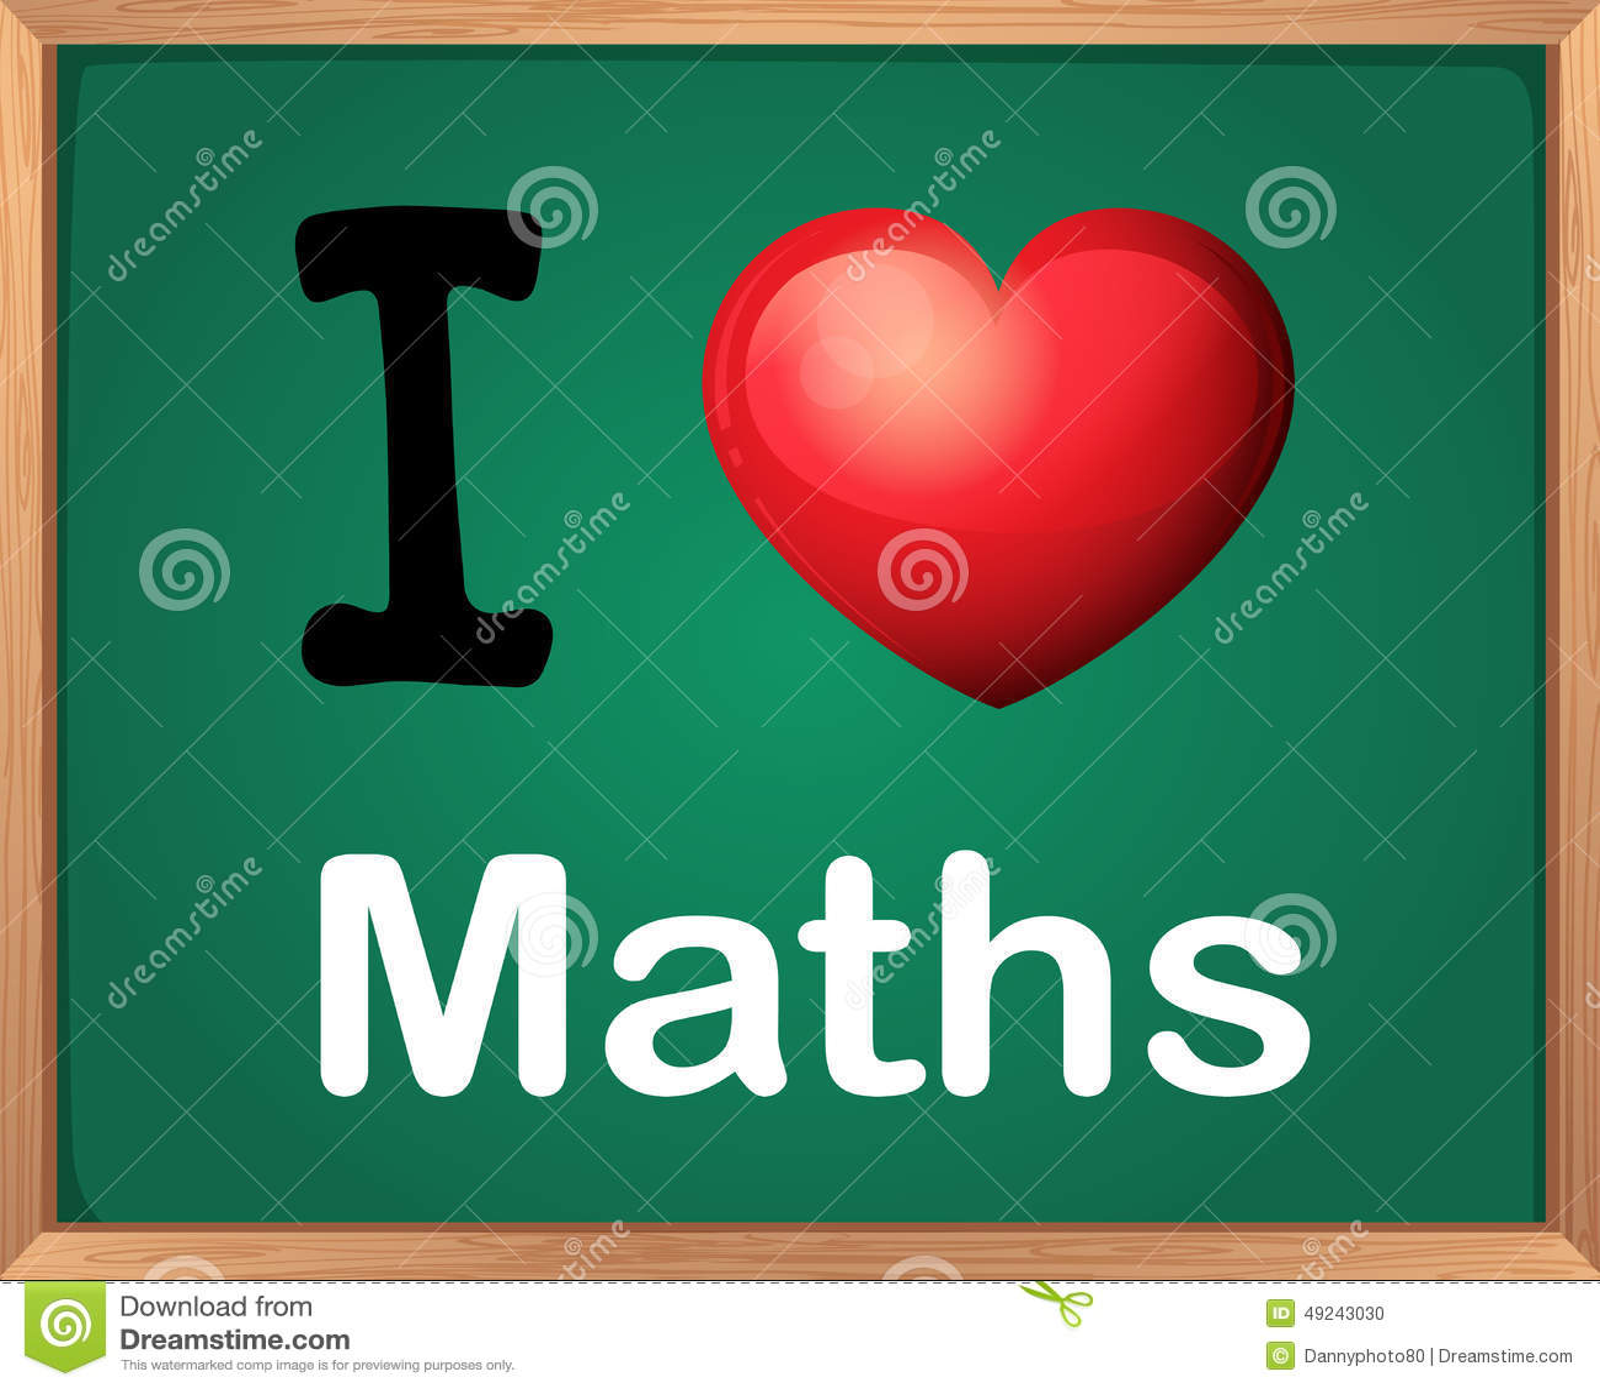 I Love Math Stock Vector Illustration Of Love Heart